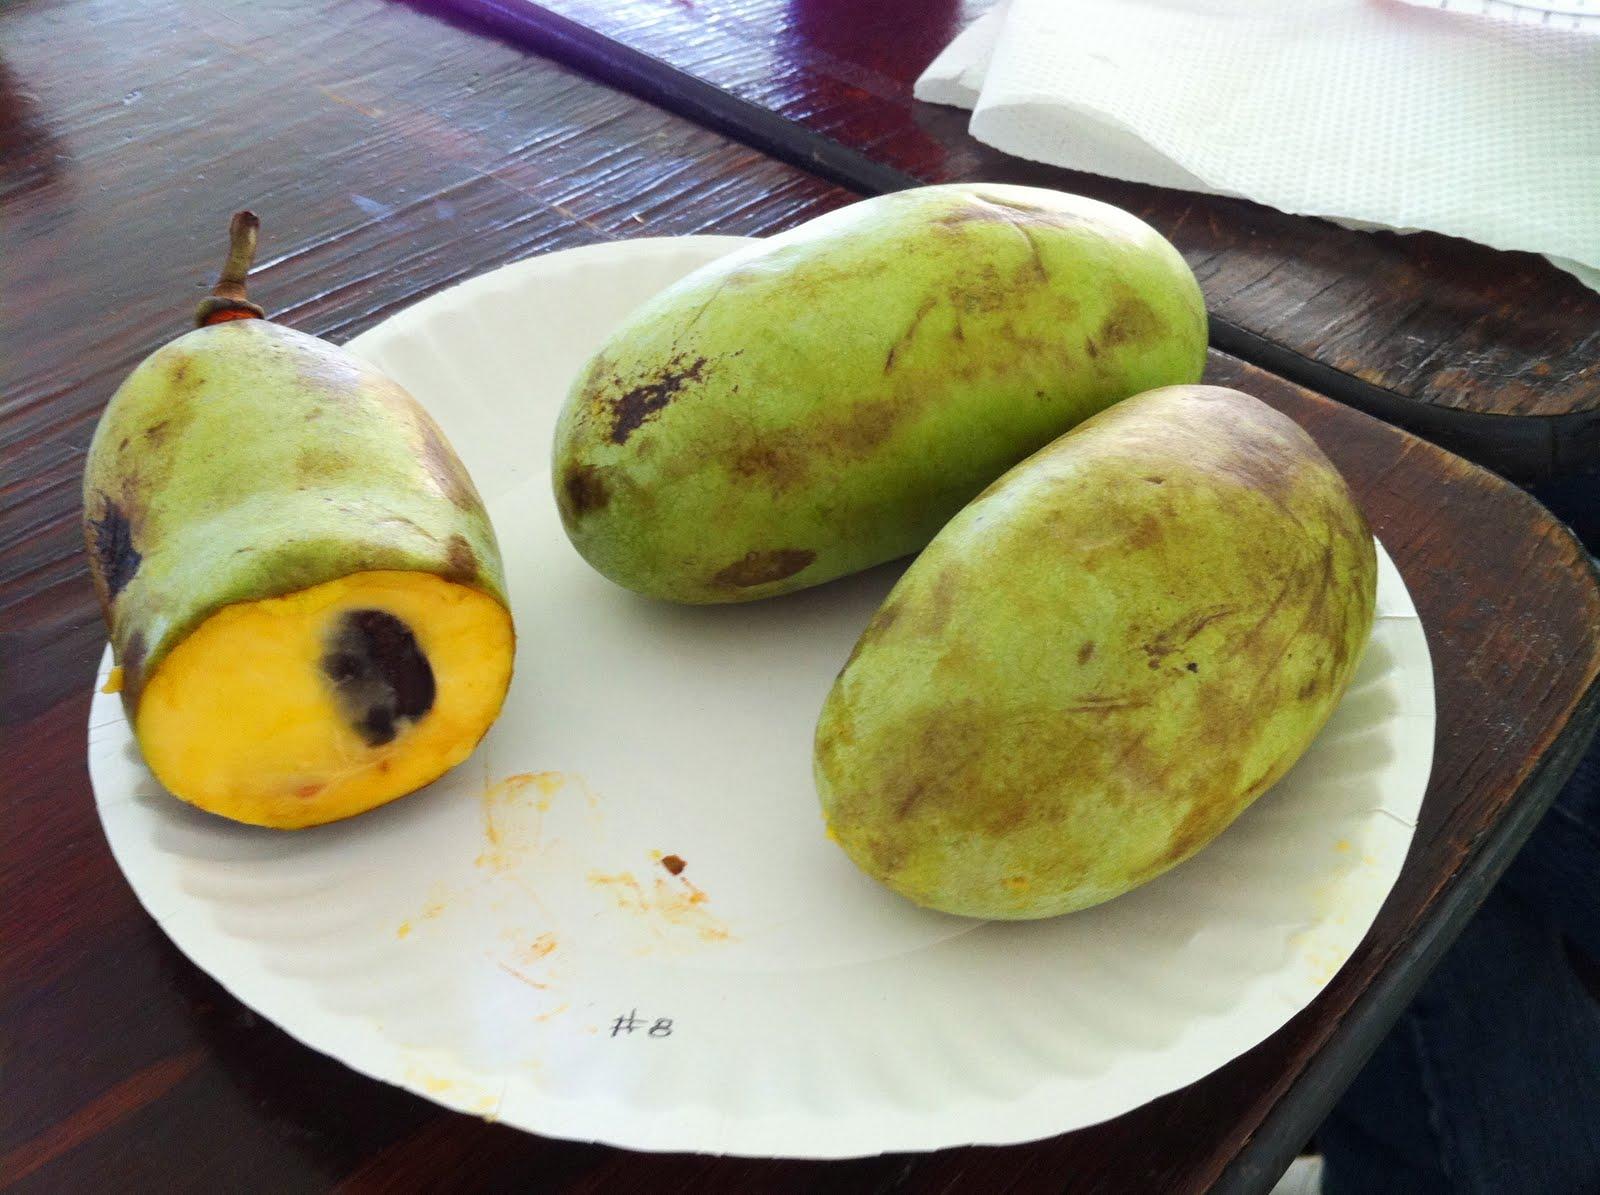 Pawpaw, North America's largest wild edible fruit.